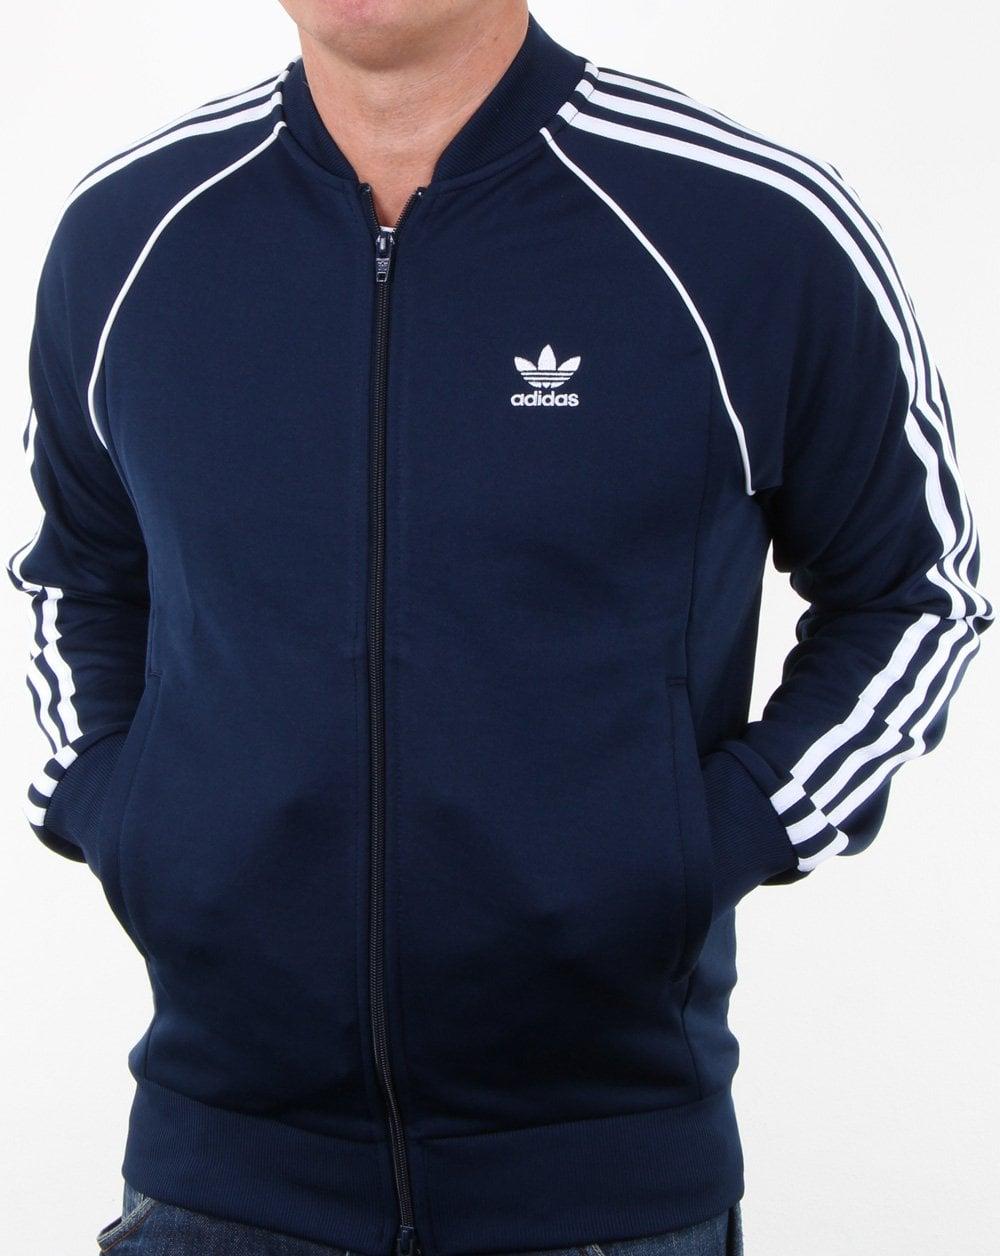 Adidas Originals Superstar Track Top Navy 80s Casual